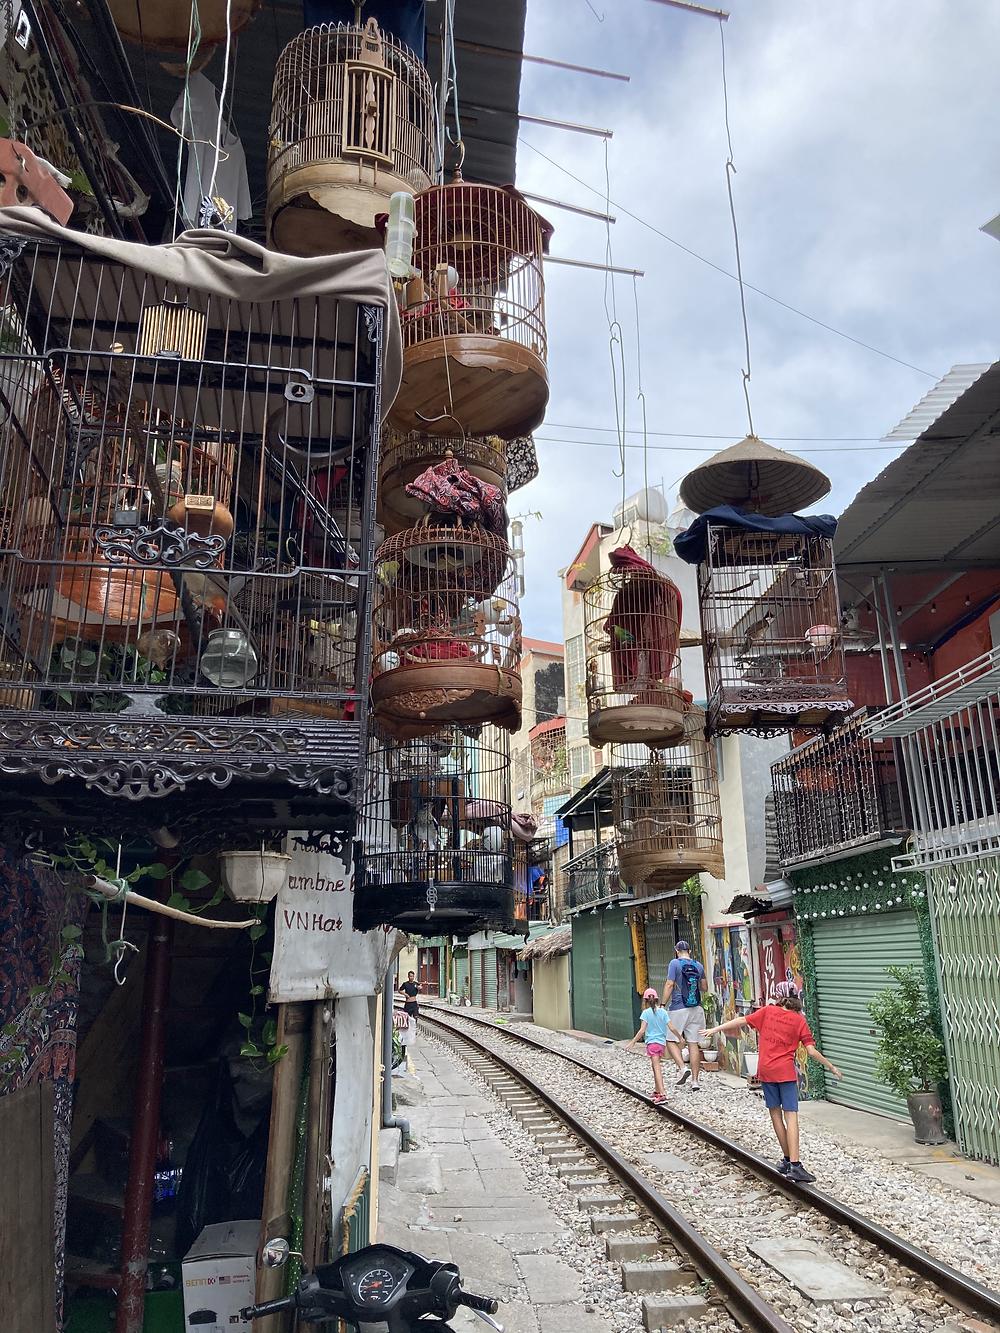 Songbirds in cages in Hanoi